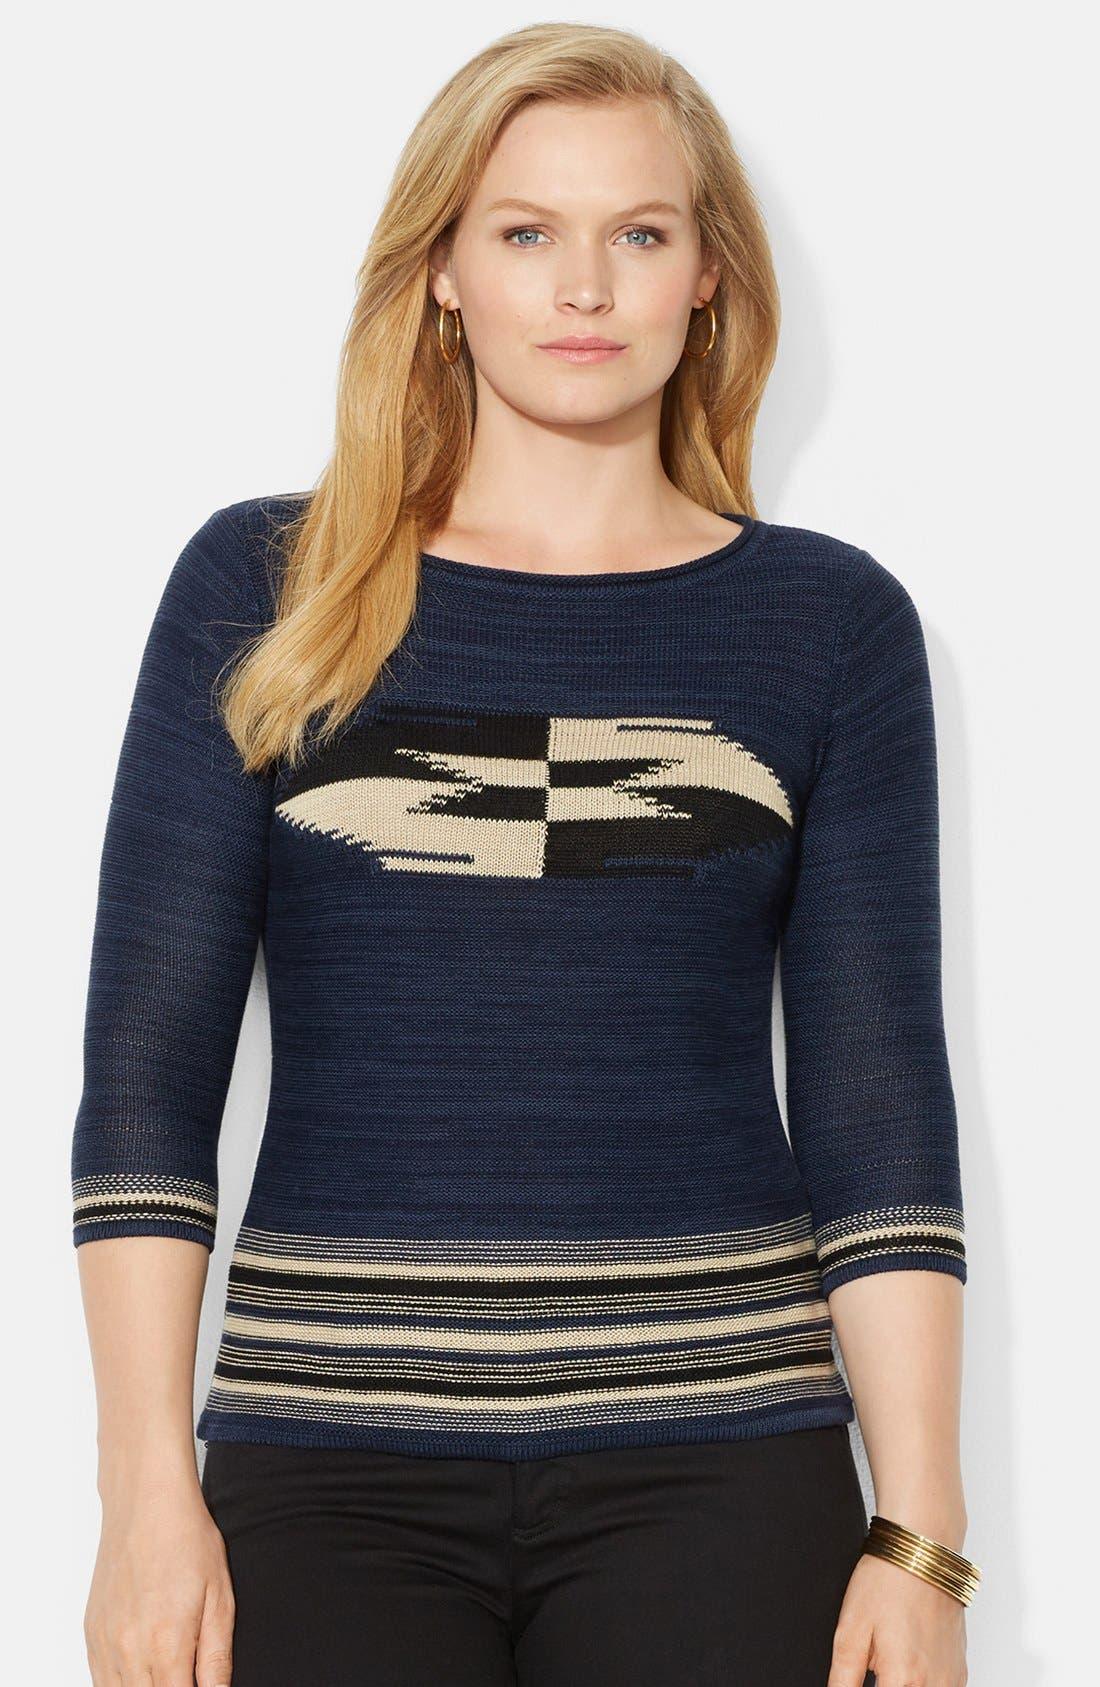 Main Image - Lauren Ralph Lauren Ballet Neck Patterned Sweater (Plus Size)